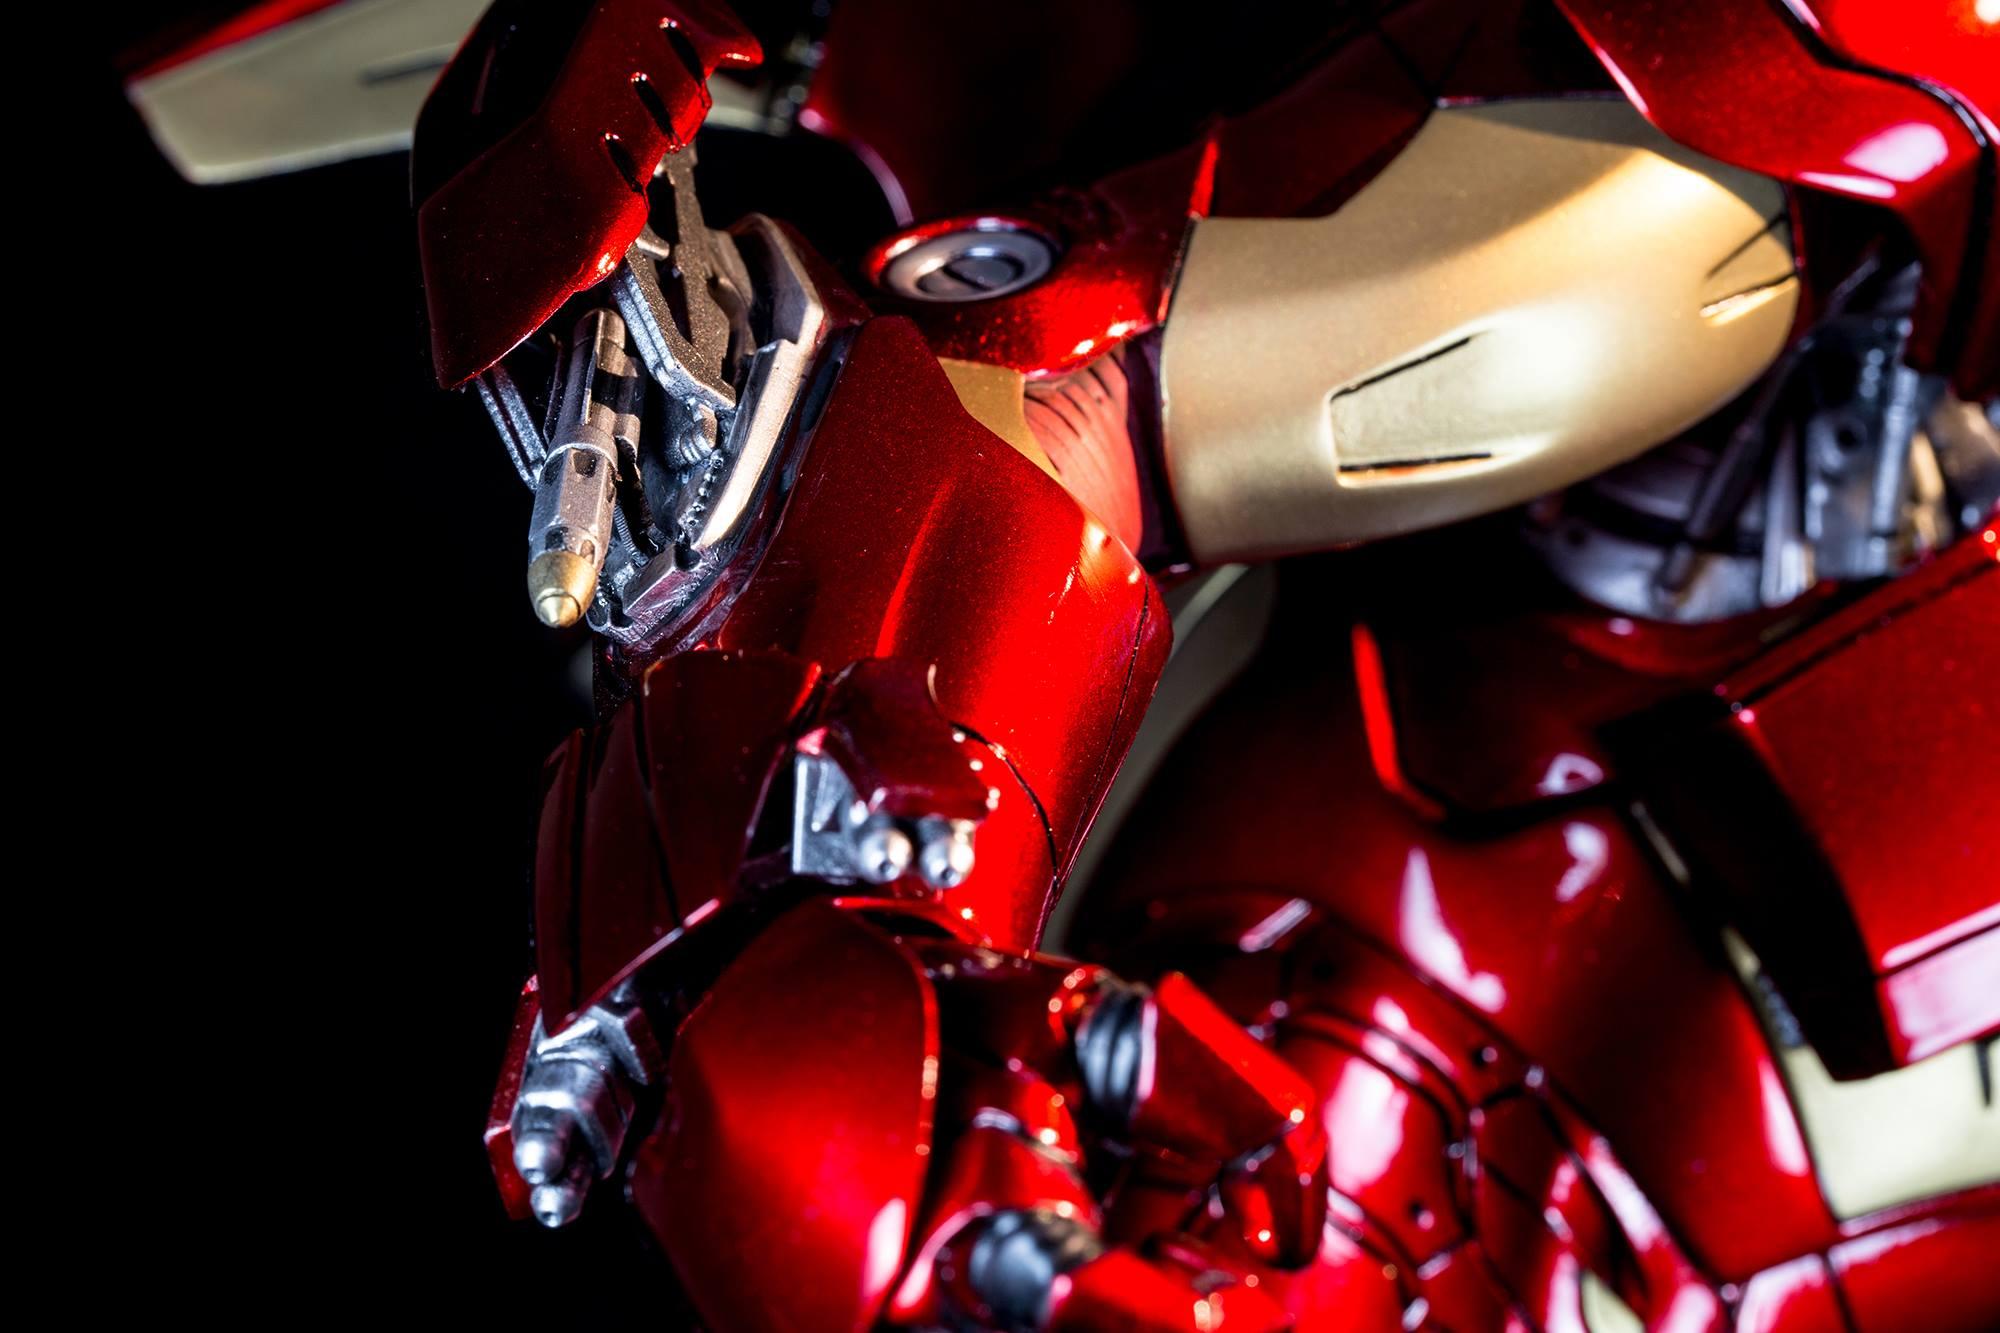 Premium Collectibles : Iron man MK VII - Page 2 5255201051730614035865798620371170424530695302937o